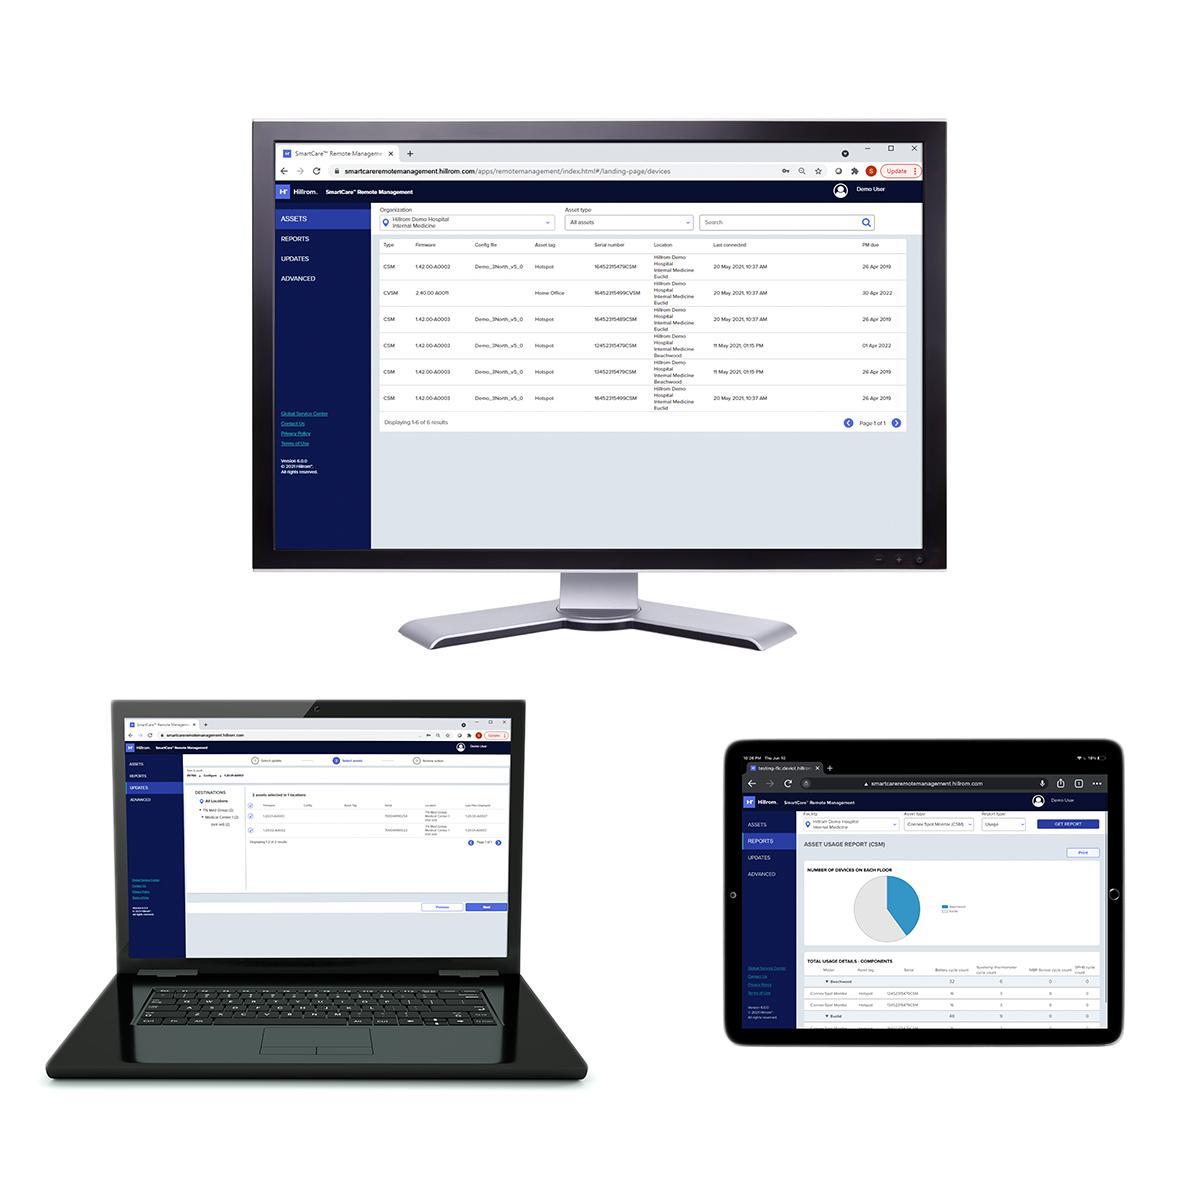 SmartCare™ Remote Management software is displayed on multiple devices — a laptop, desktop computer and tablet.